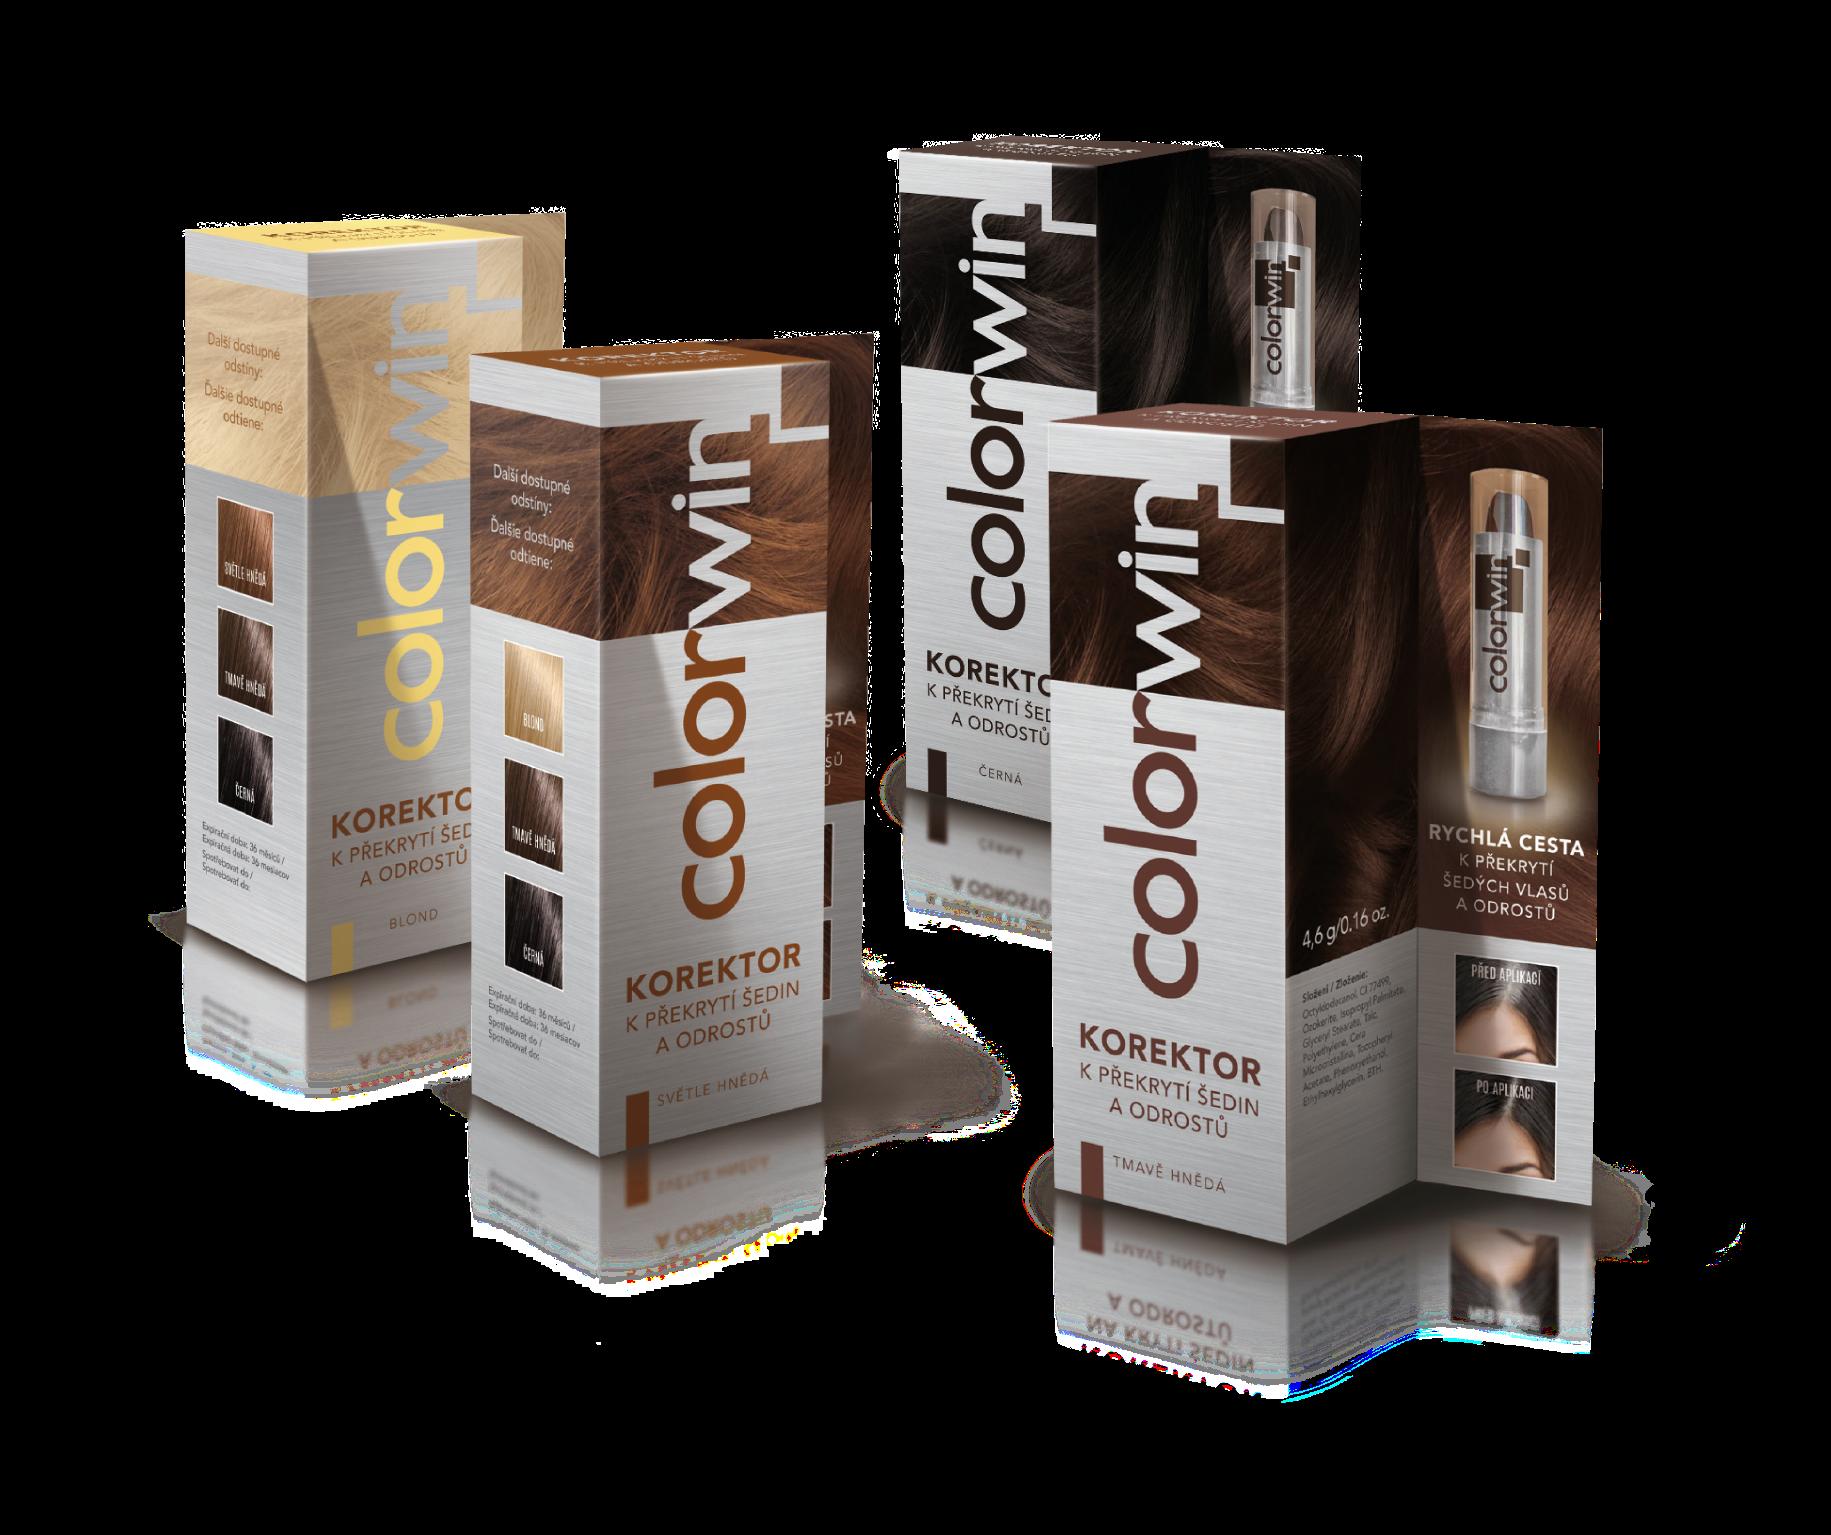 Colorwin Korektor - na krytí šedivých vlasů a odrostů, 4,6 g